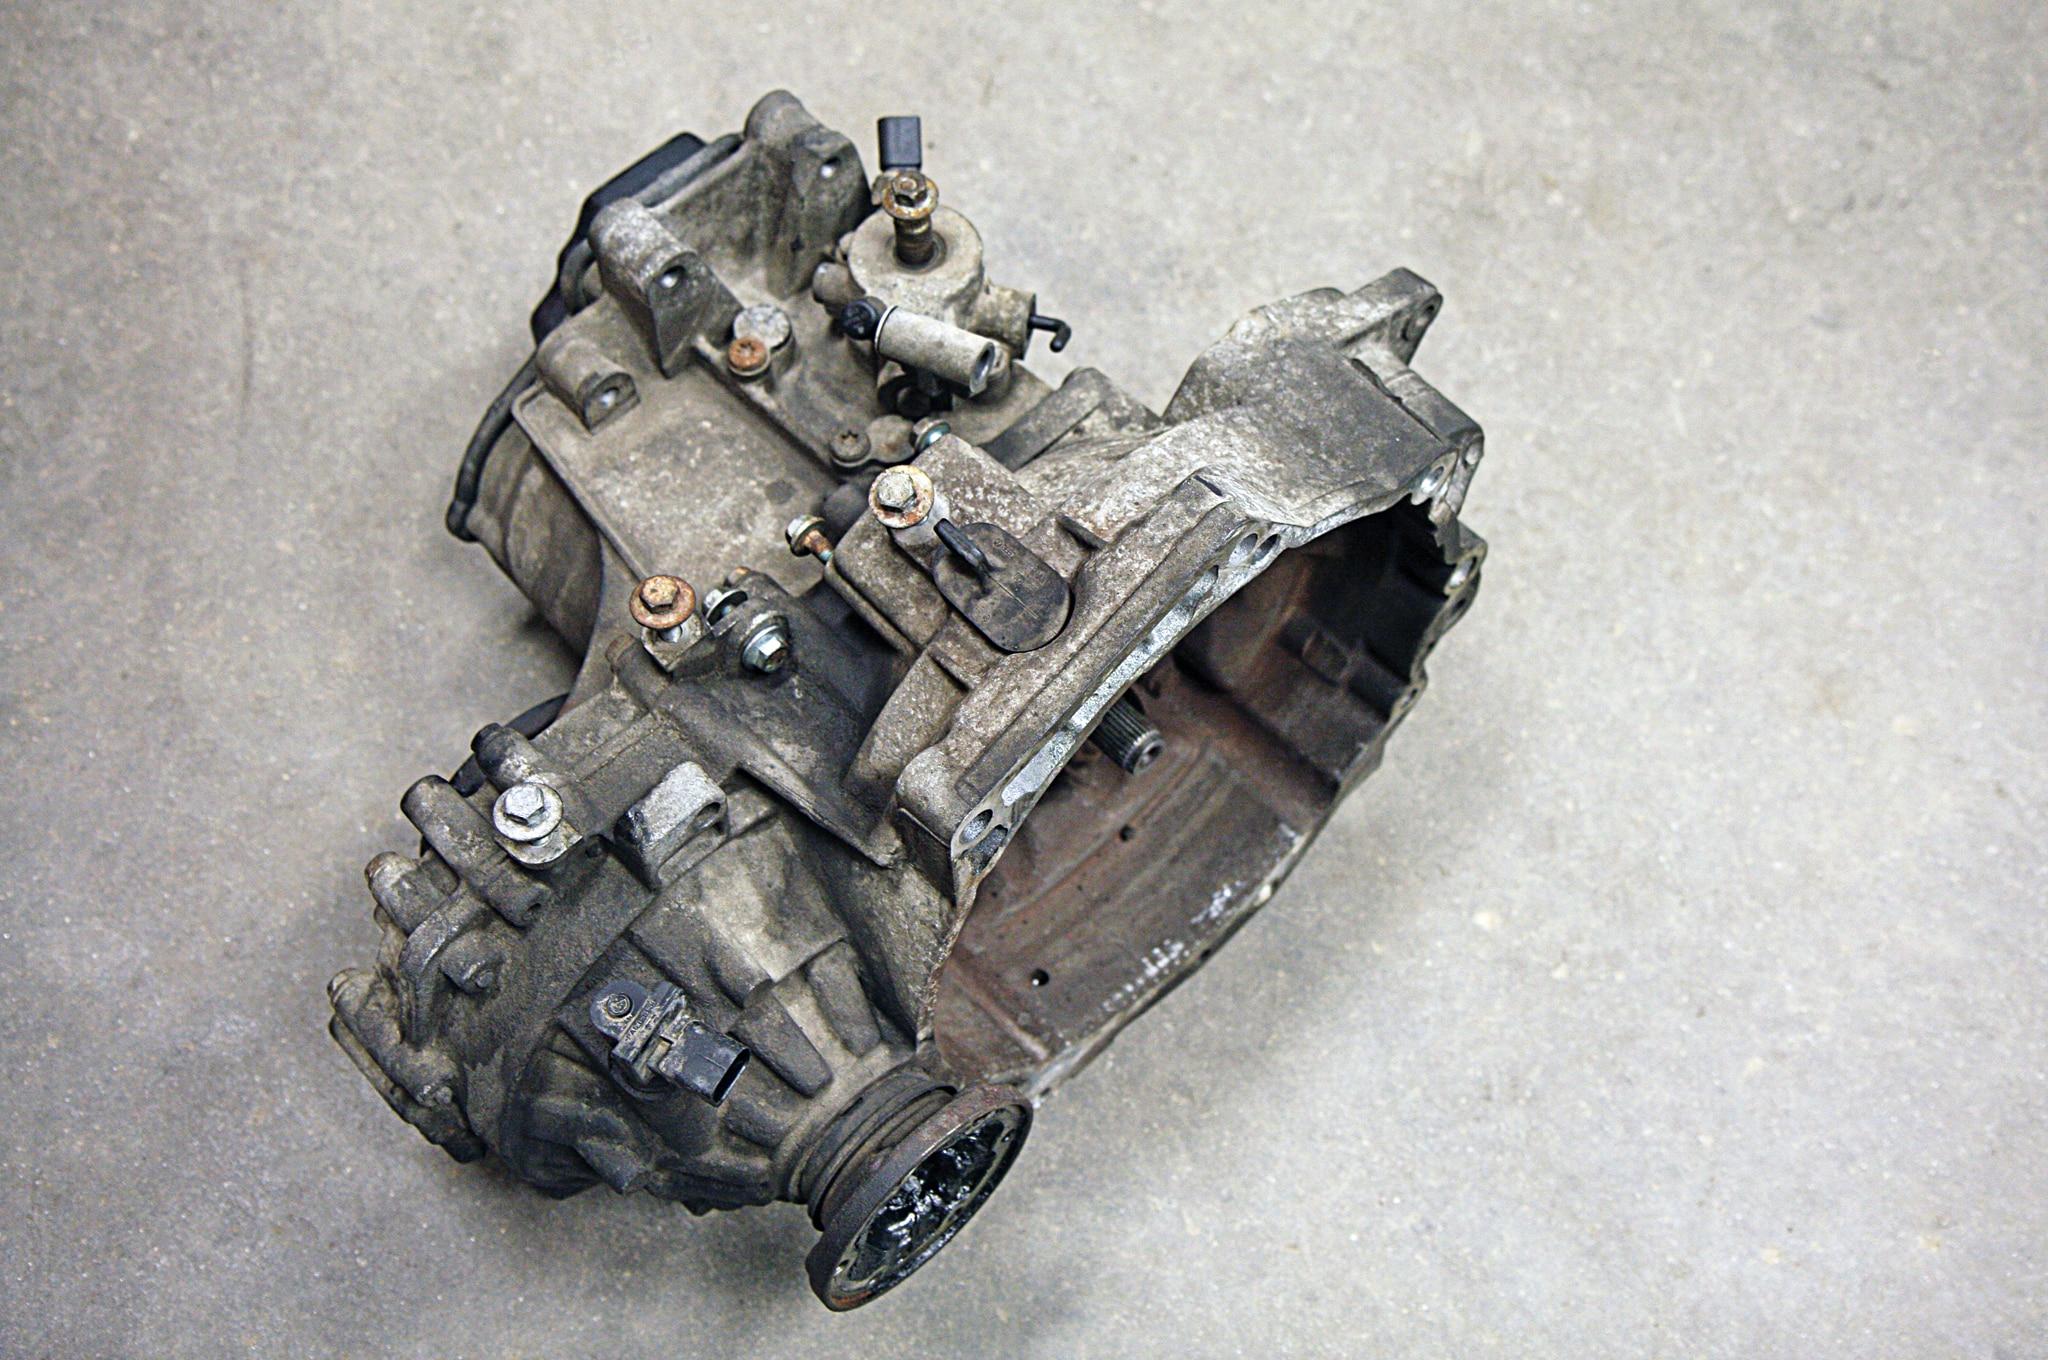 2002 Volkswagen Jetta TDI - Jetta Fever Part 1Truck Trend